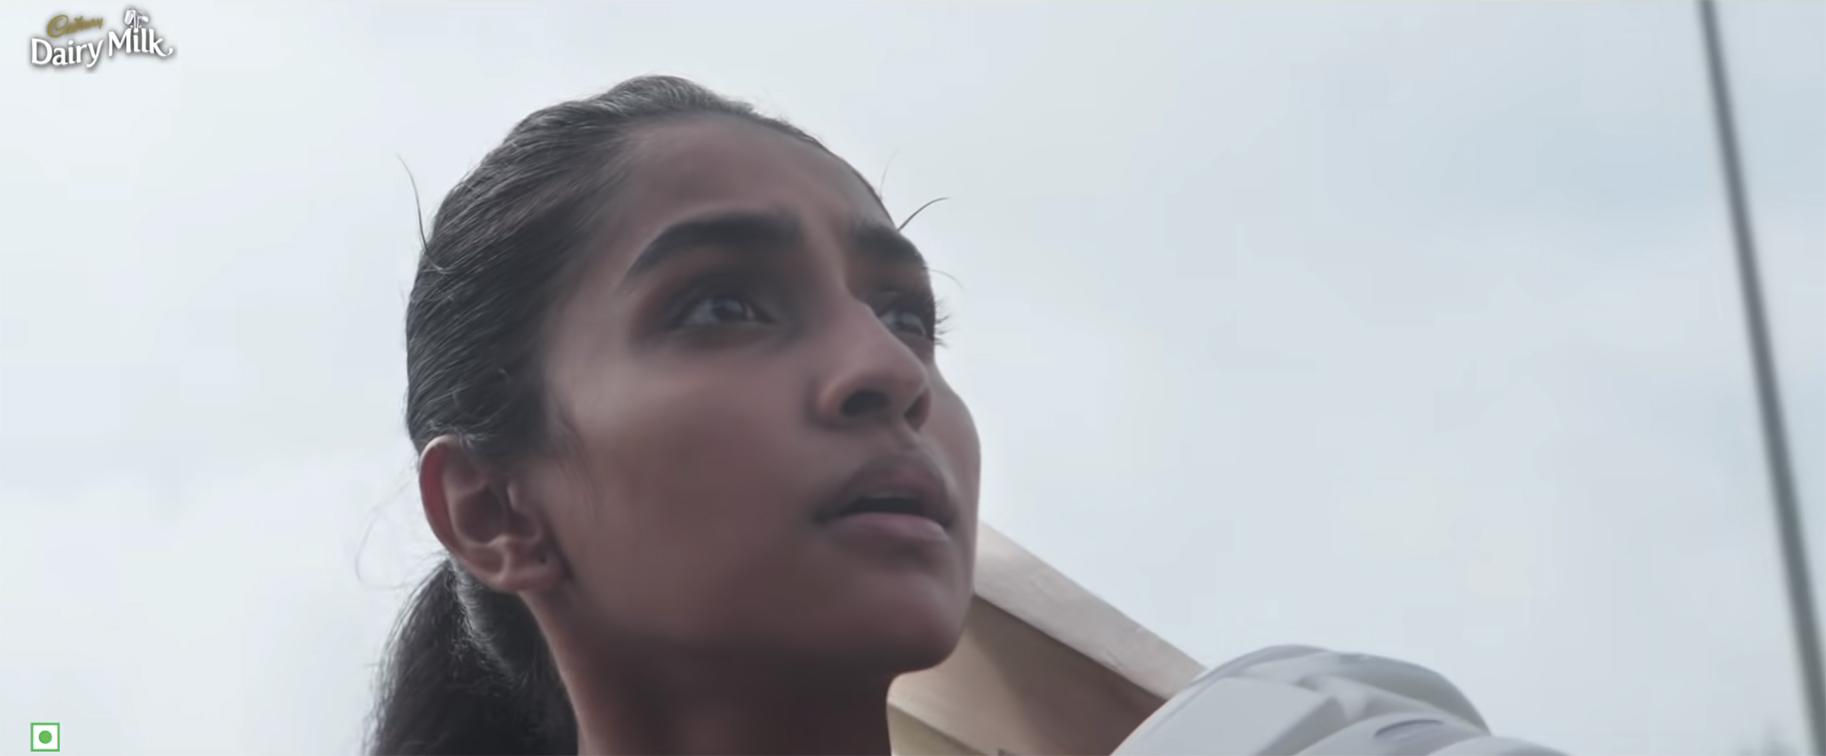 Ogilvy India celebrates women's cricket by reimagining the classic 1993 Cadbury Cricket film